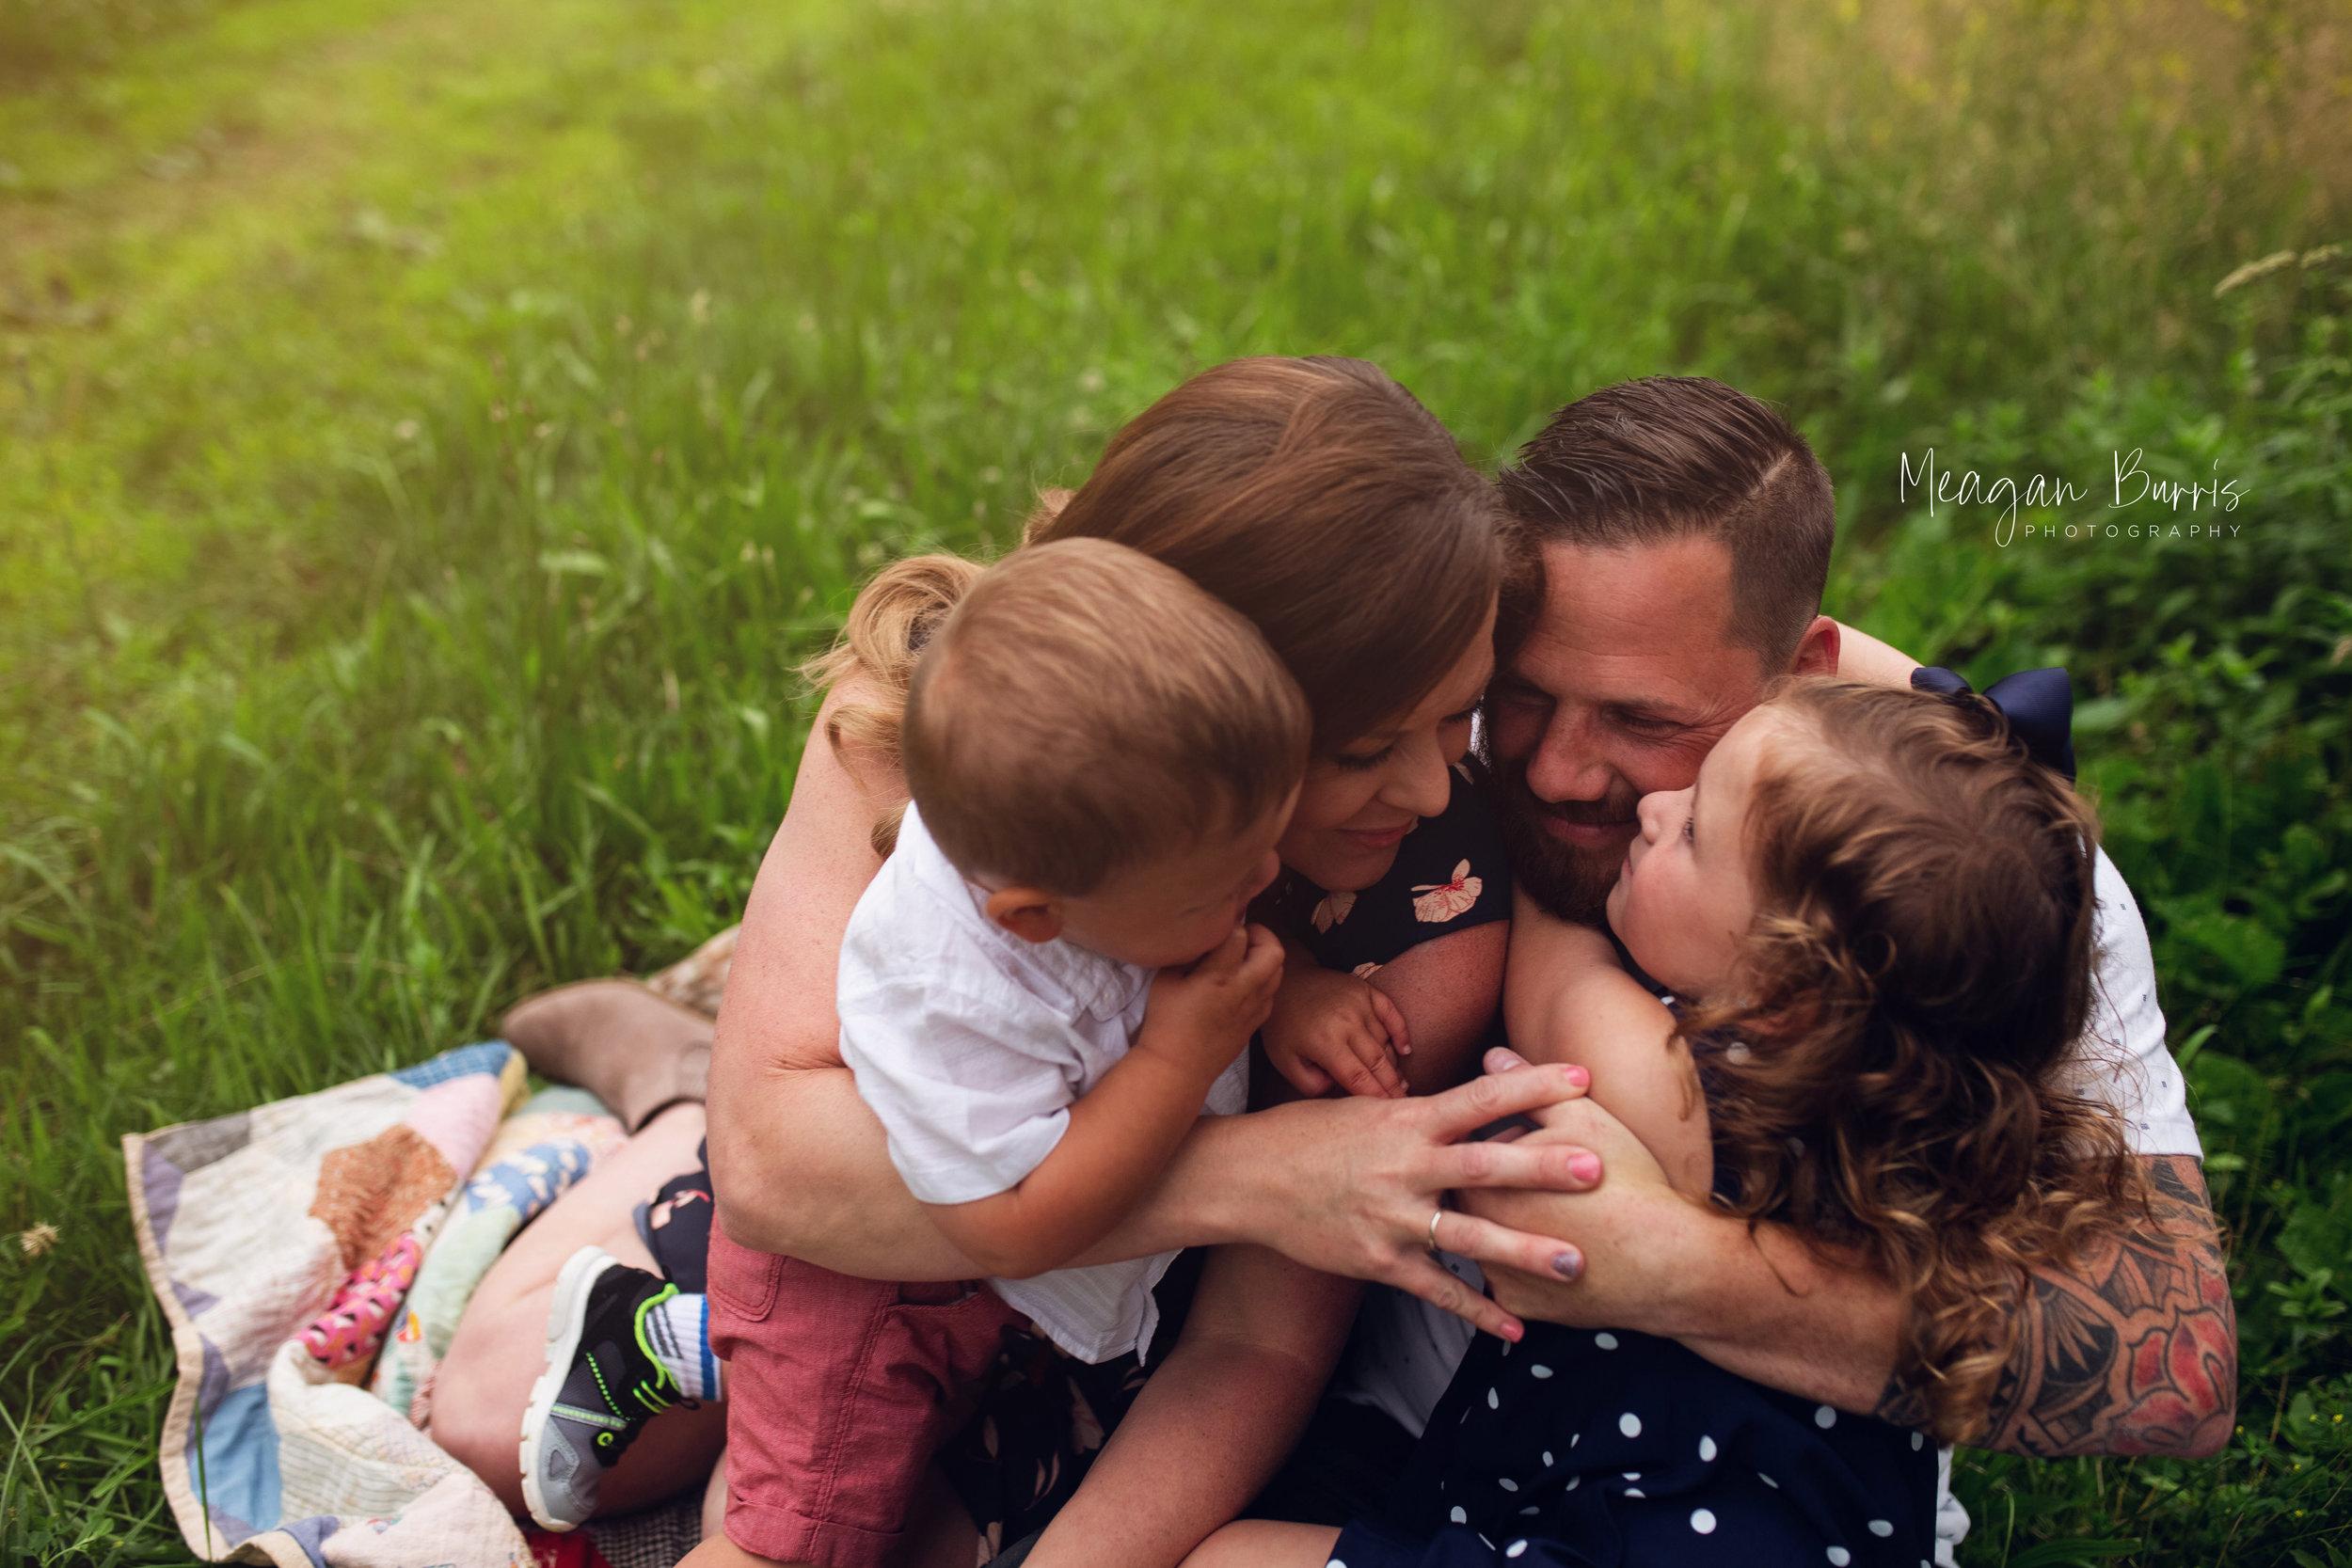 burris_ New palestine family photographer3.jpg